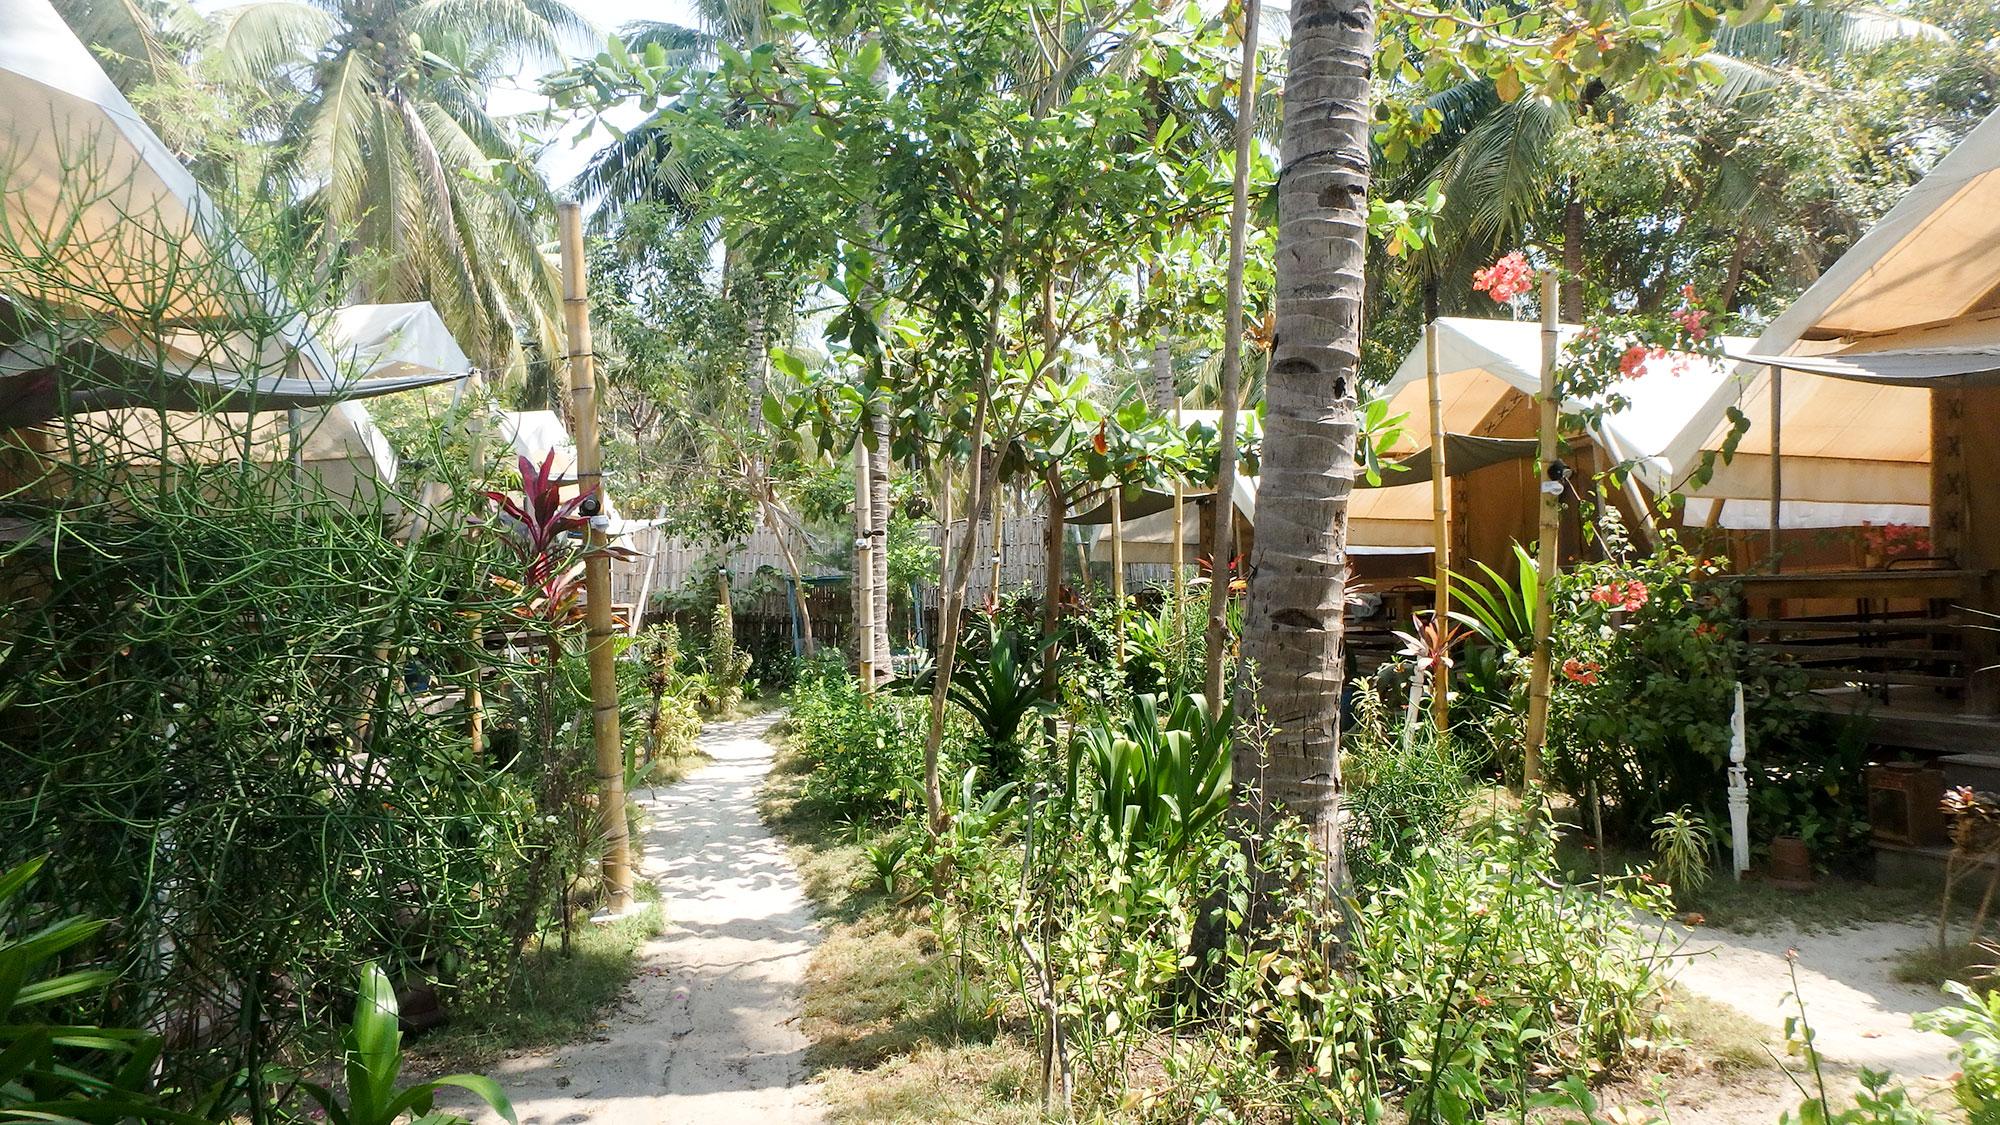 la cocoteraie coconut grove